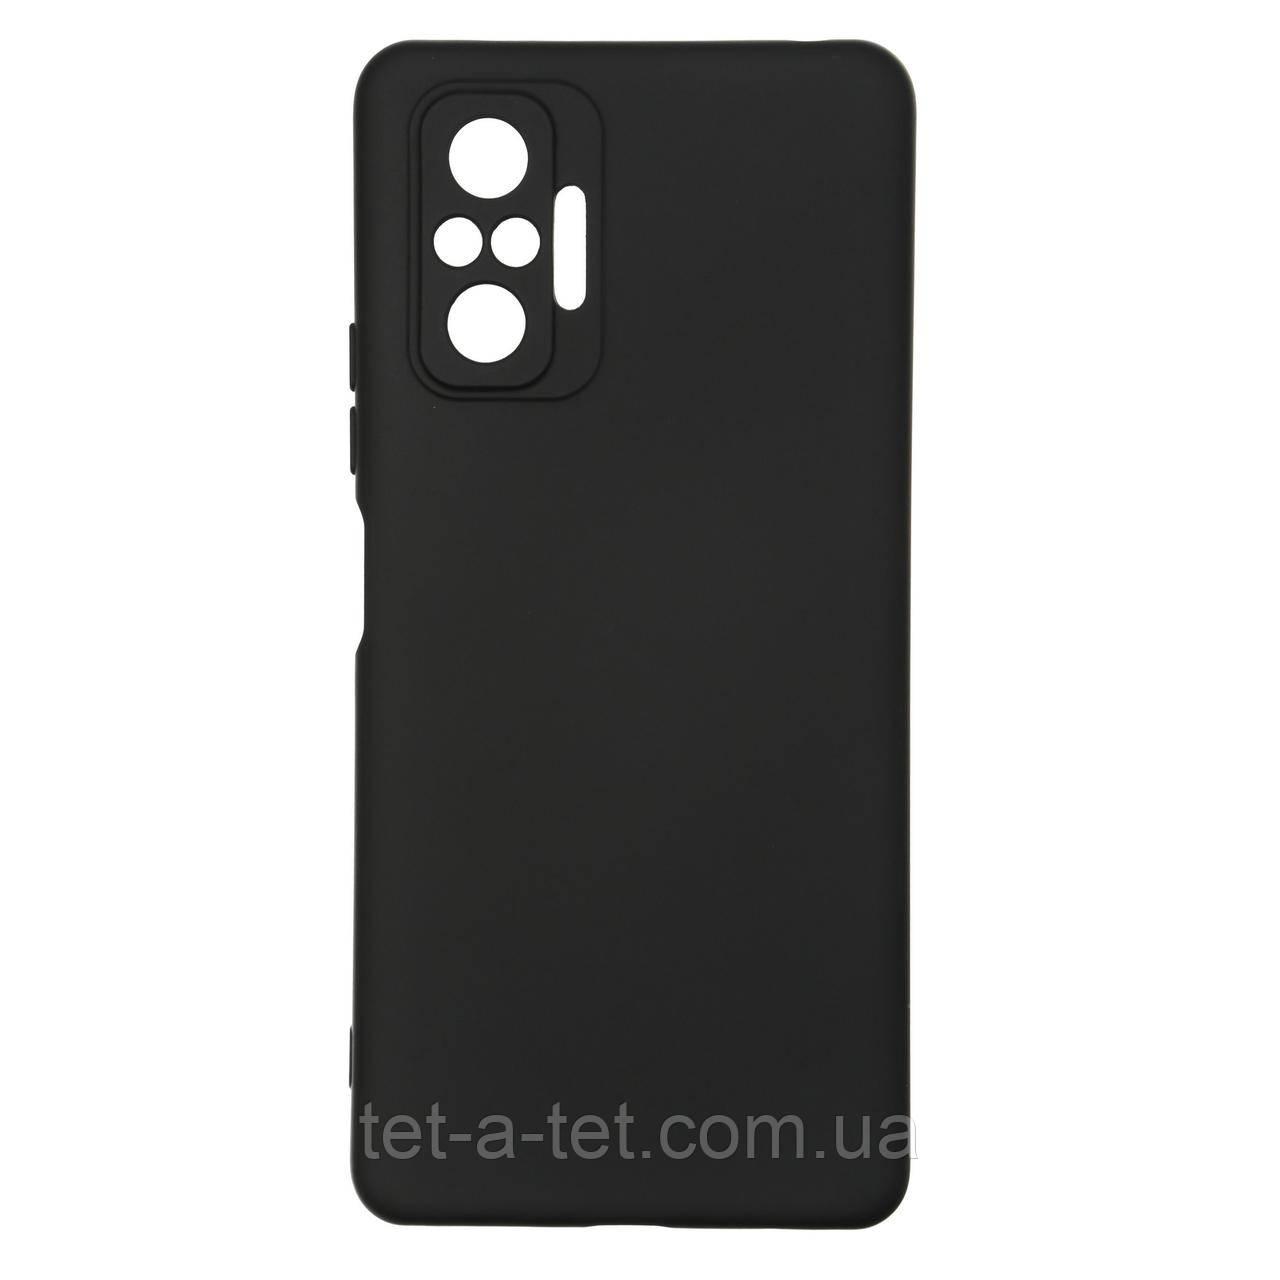 Чехол силиконовый ArmorStandart ICON Case for Xiaomi Redmi Note 10 Pro Black